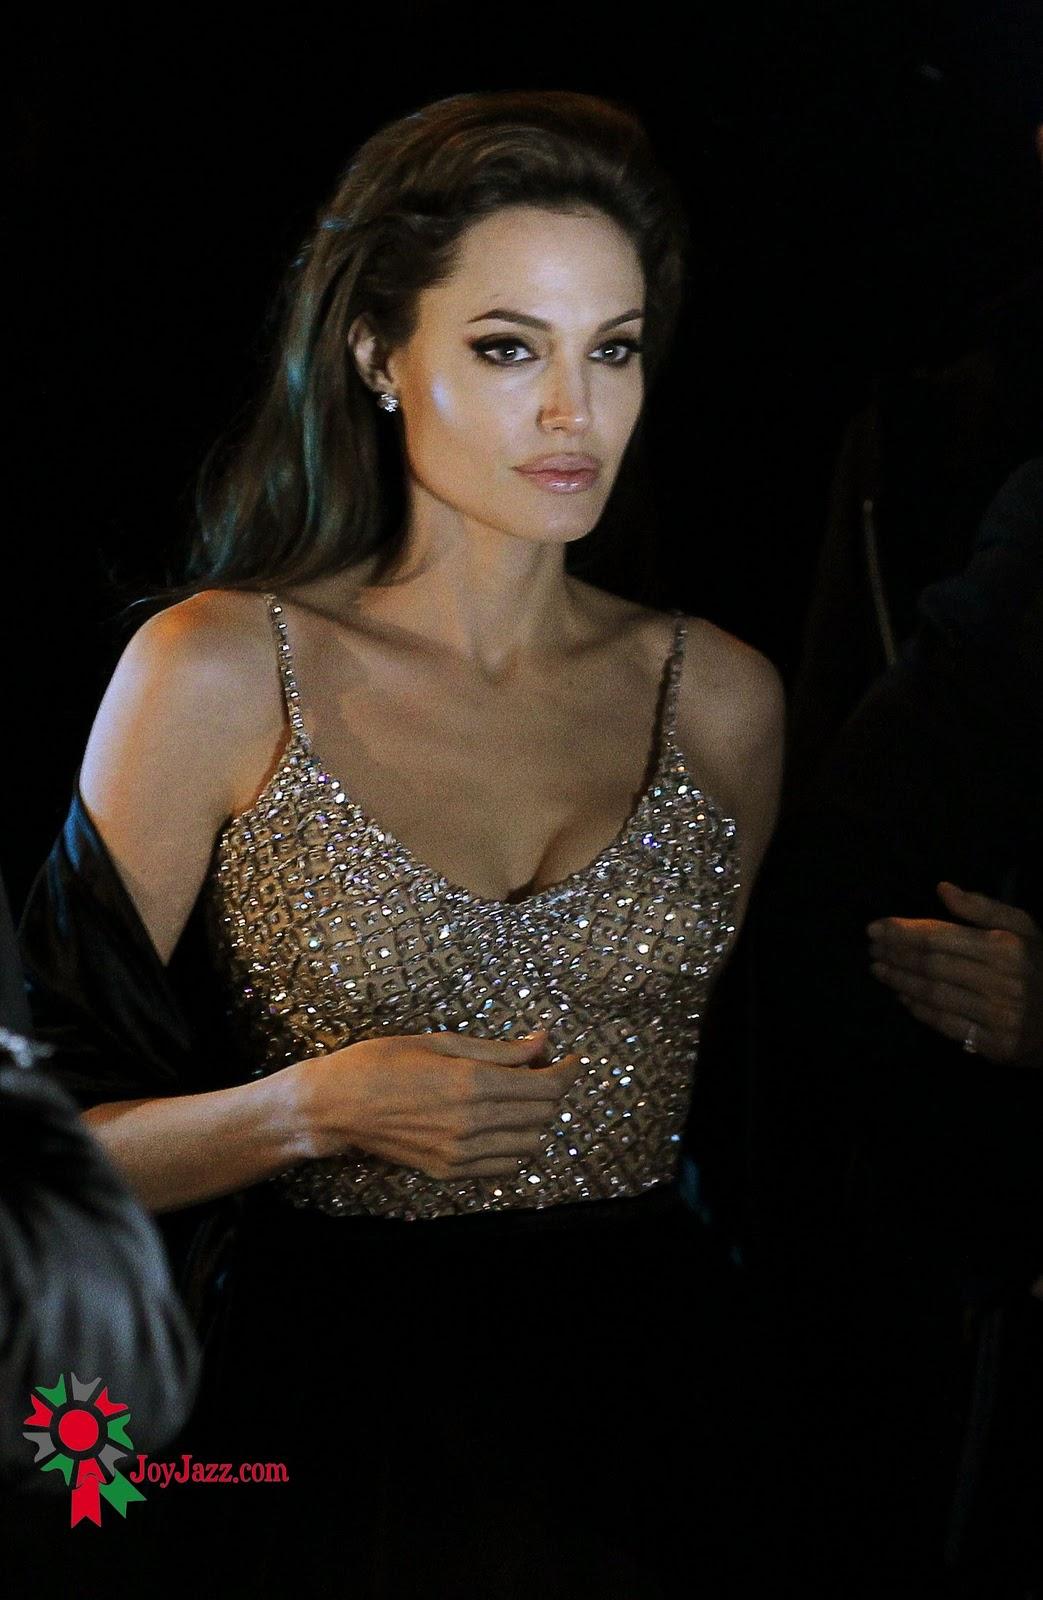 http://2.bp.blogspot.com/_0LdSrYkvVVk/TQzYIuVwKhI/AAAAAAAABjM/7vn6jreQOzo/s1600/Angelina-Jolie-91.jpg